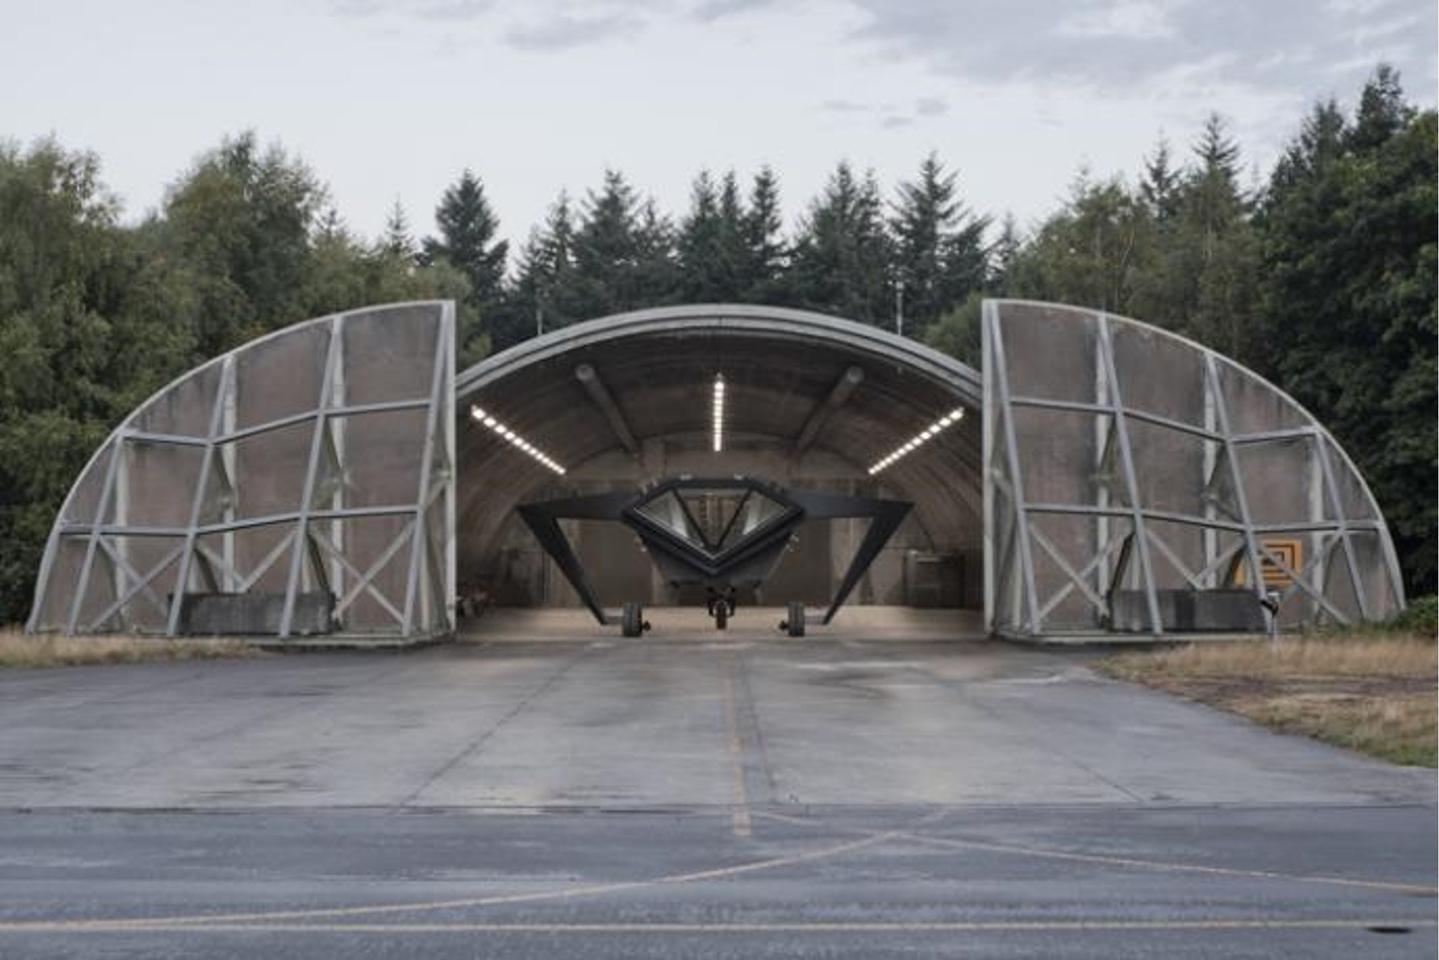 Secret Operation 610 is housed in a reused hangar (Image: Rietveld Landscape, Studio Frank Havermans, Michiel de Cleene)